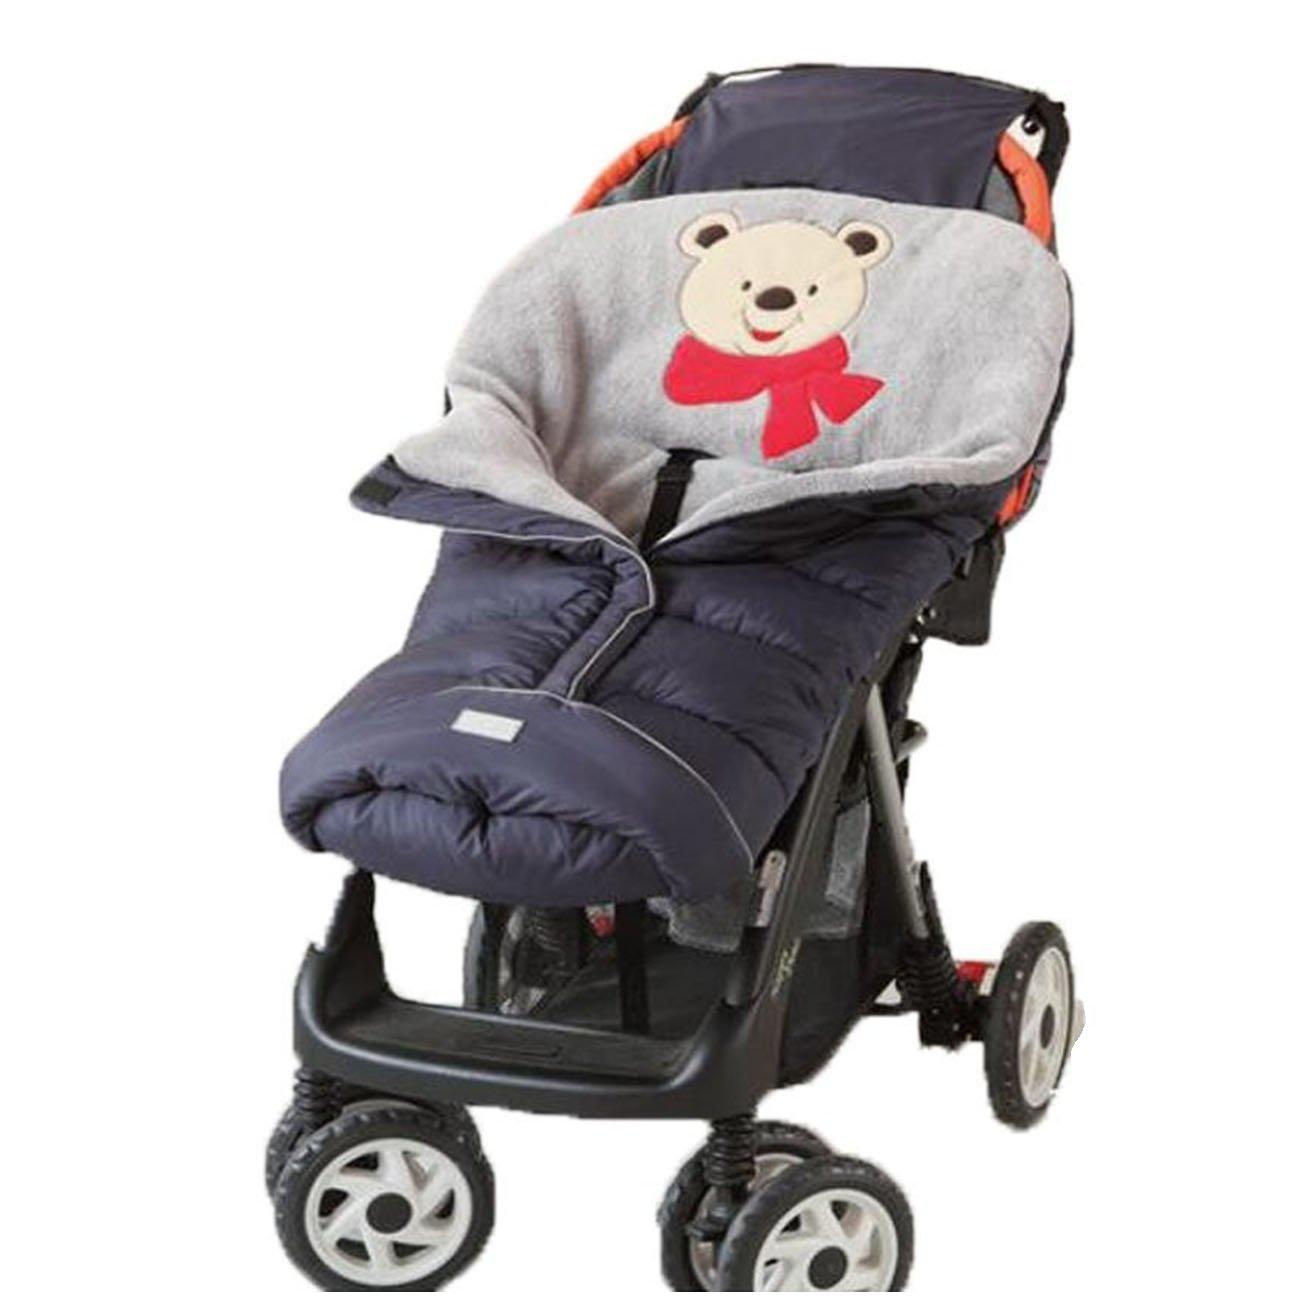 Universal Baby Stroller Sleeping Bag Footmuff Sack Winter Outdoor Waterproof Swaddling Blankets (Blue(0-6M)) cattam0110